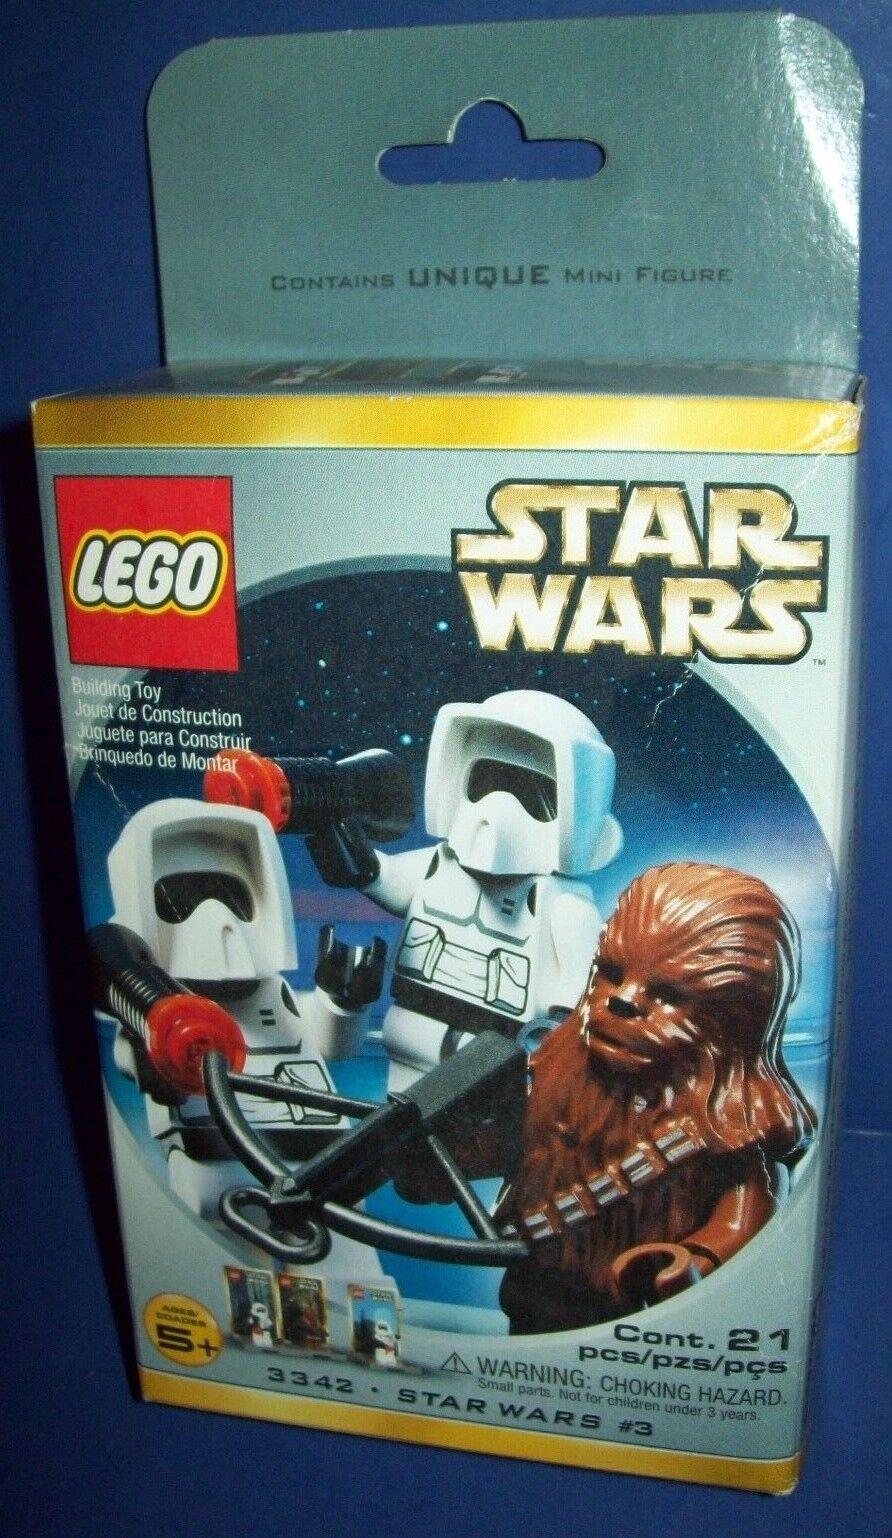 LEGO Star Wars 3342  2 Chewbacca Biker Scout  New Factory Sealed HTF